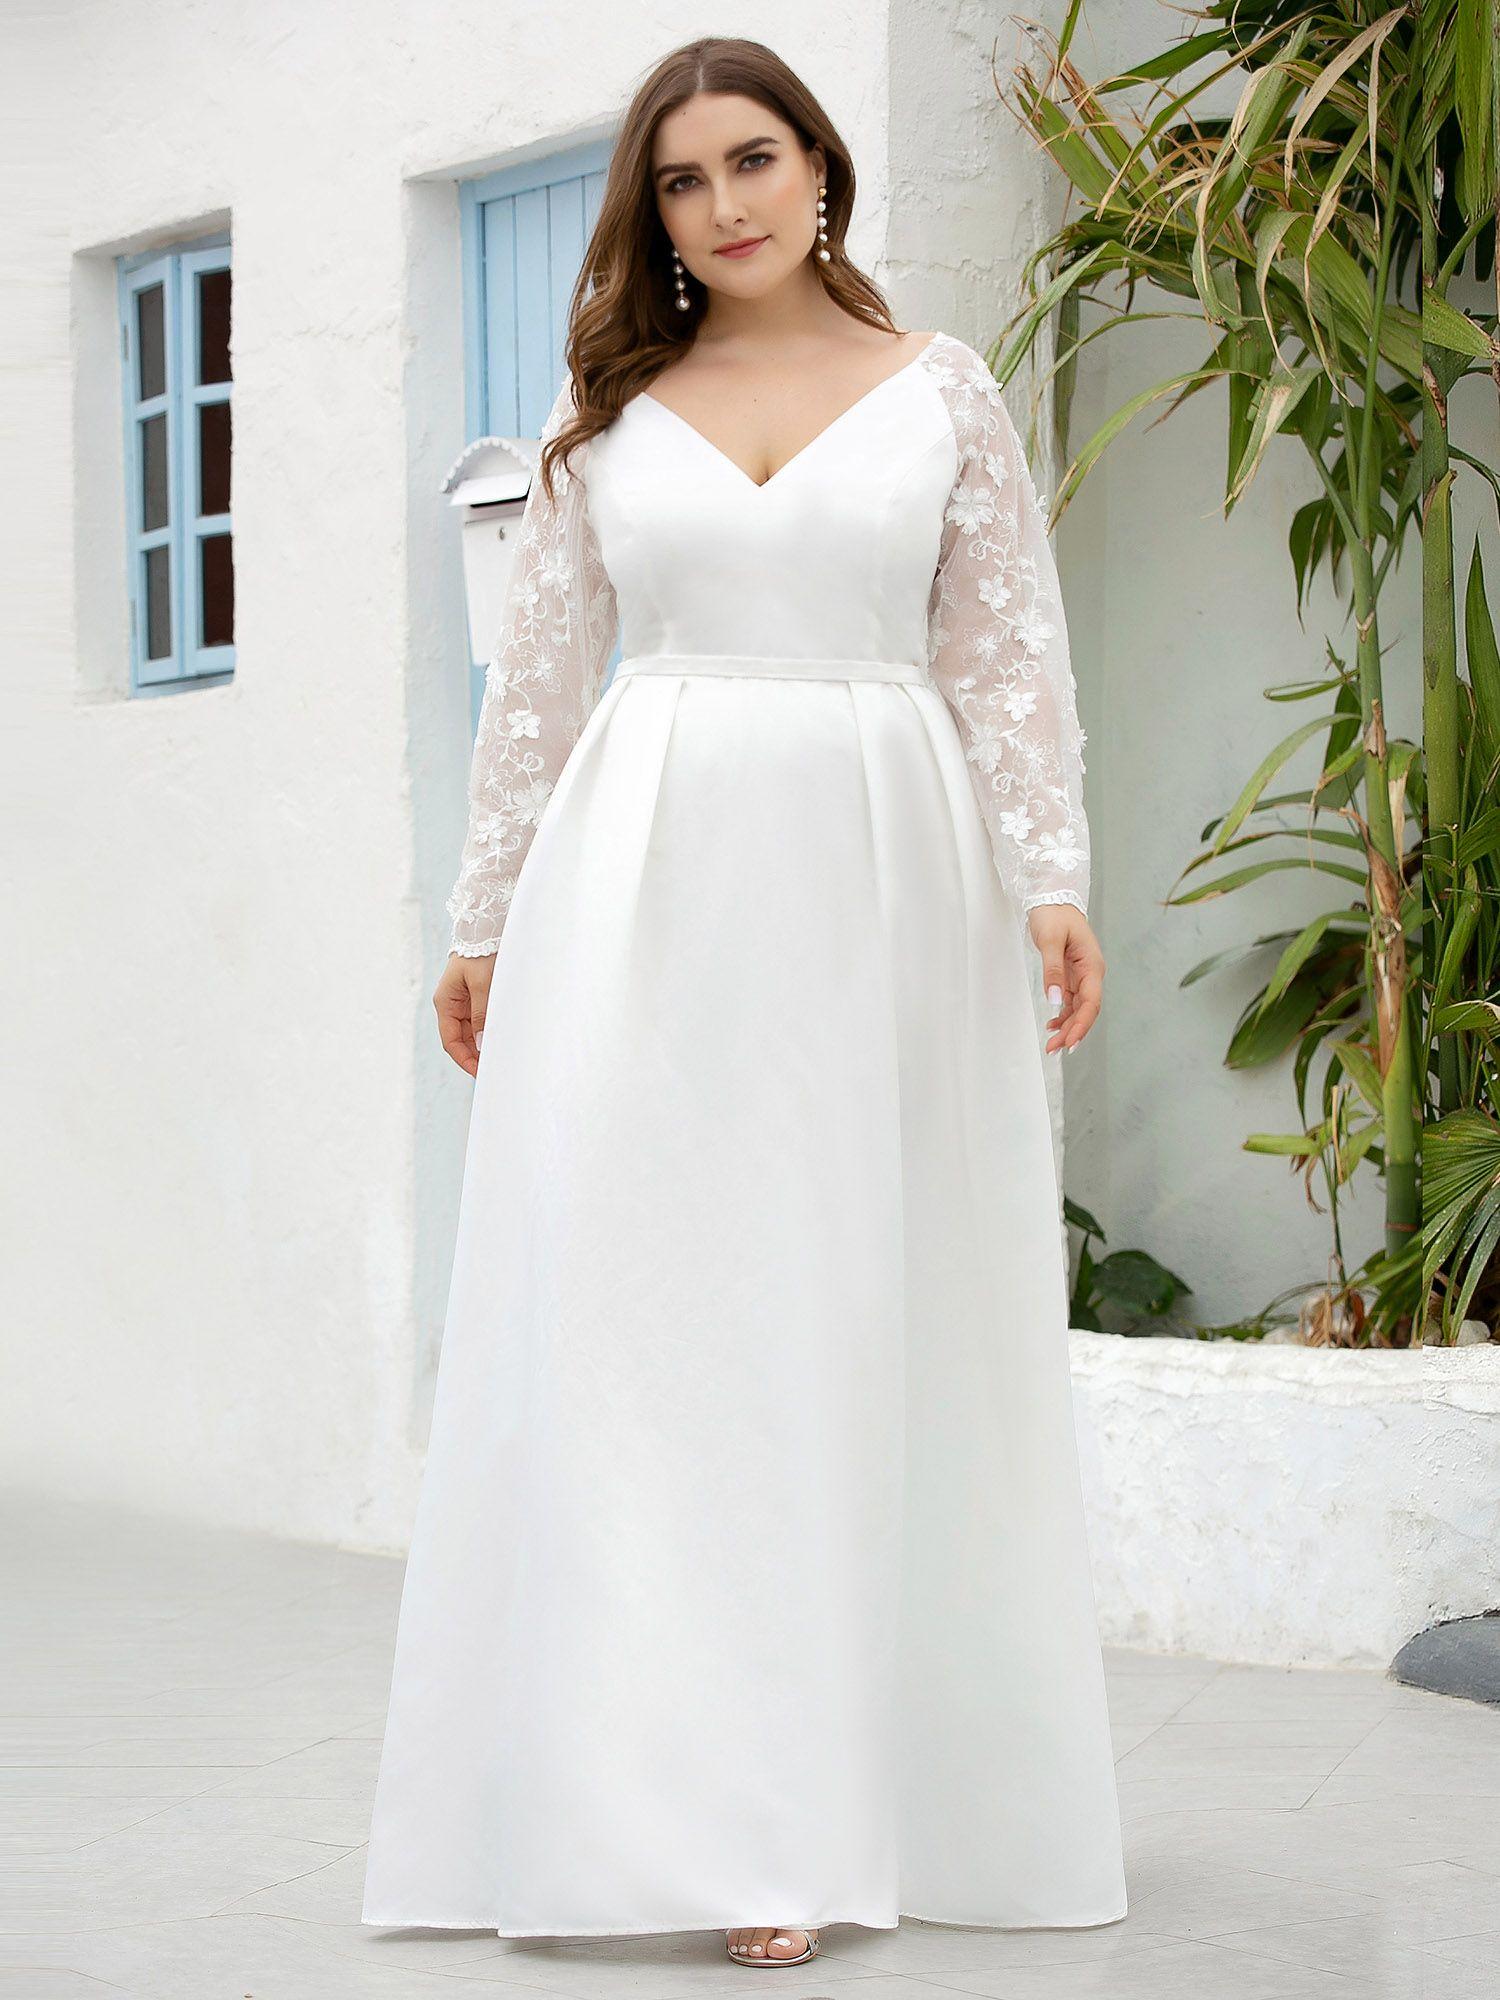 Ever Pretty Women S Floral Lace A Line Long Maxi Dress Plus Size Wedding Dress 07072 White Us14 Soft Wedding Dresses Plus Wedding Dresses Modest White Dress [ 2000 x 1500 Pixel ]